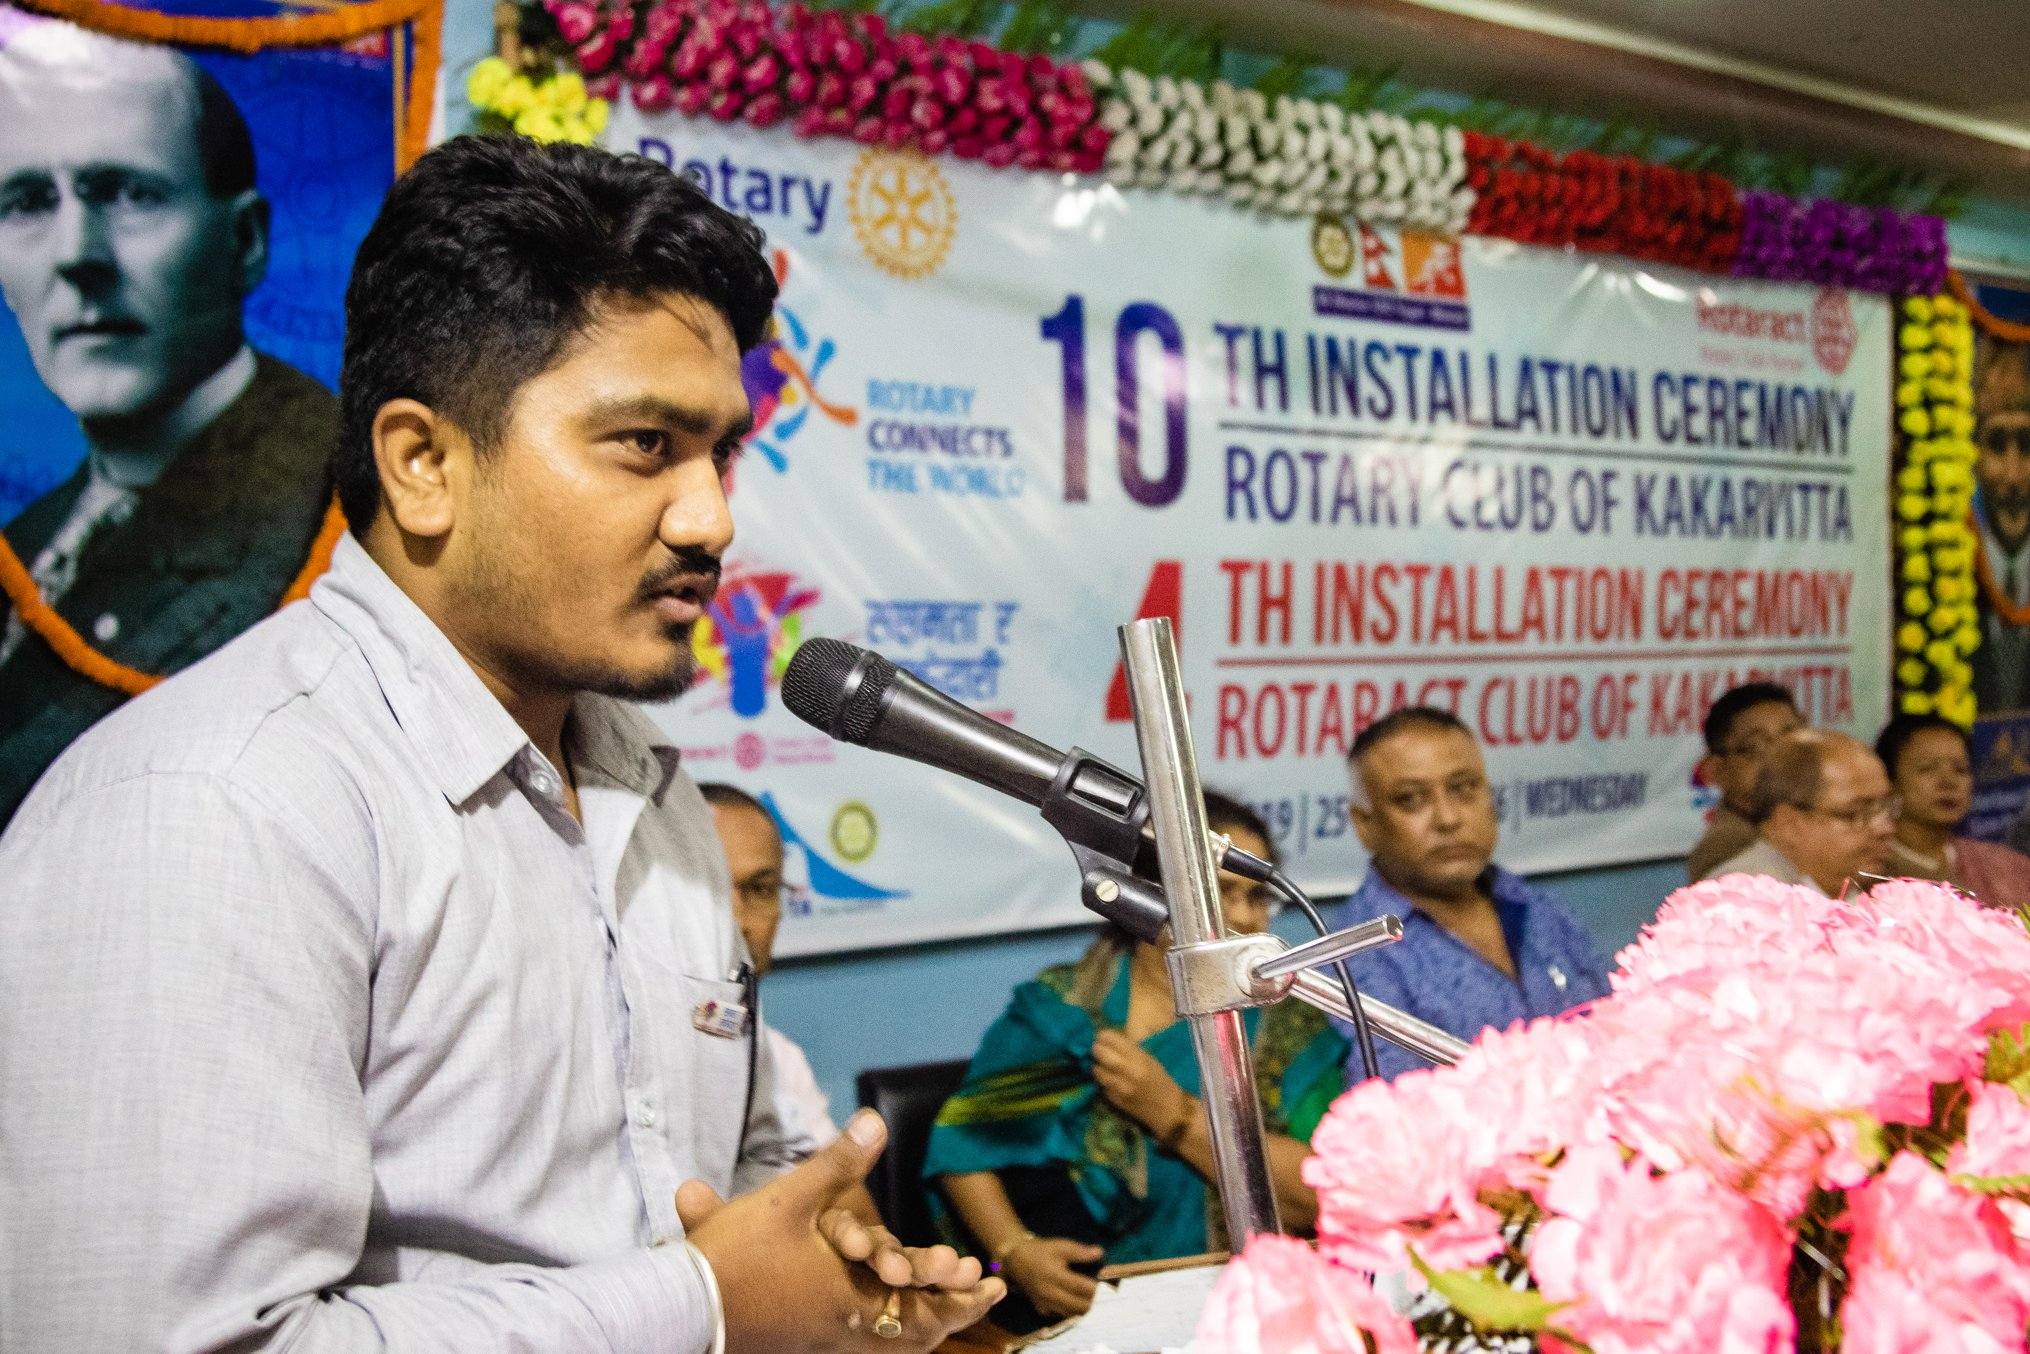 10th Installation Ceremony Rotary Club Of Kakarvitta 42